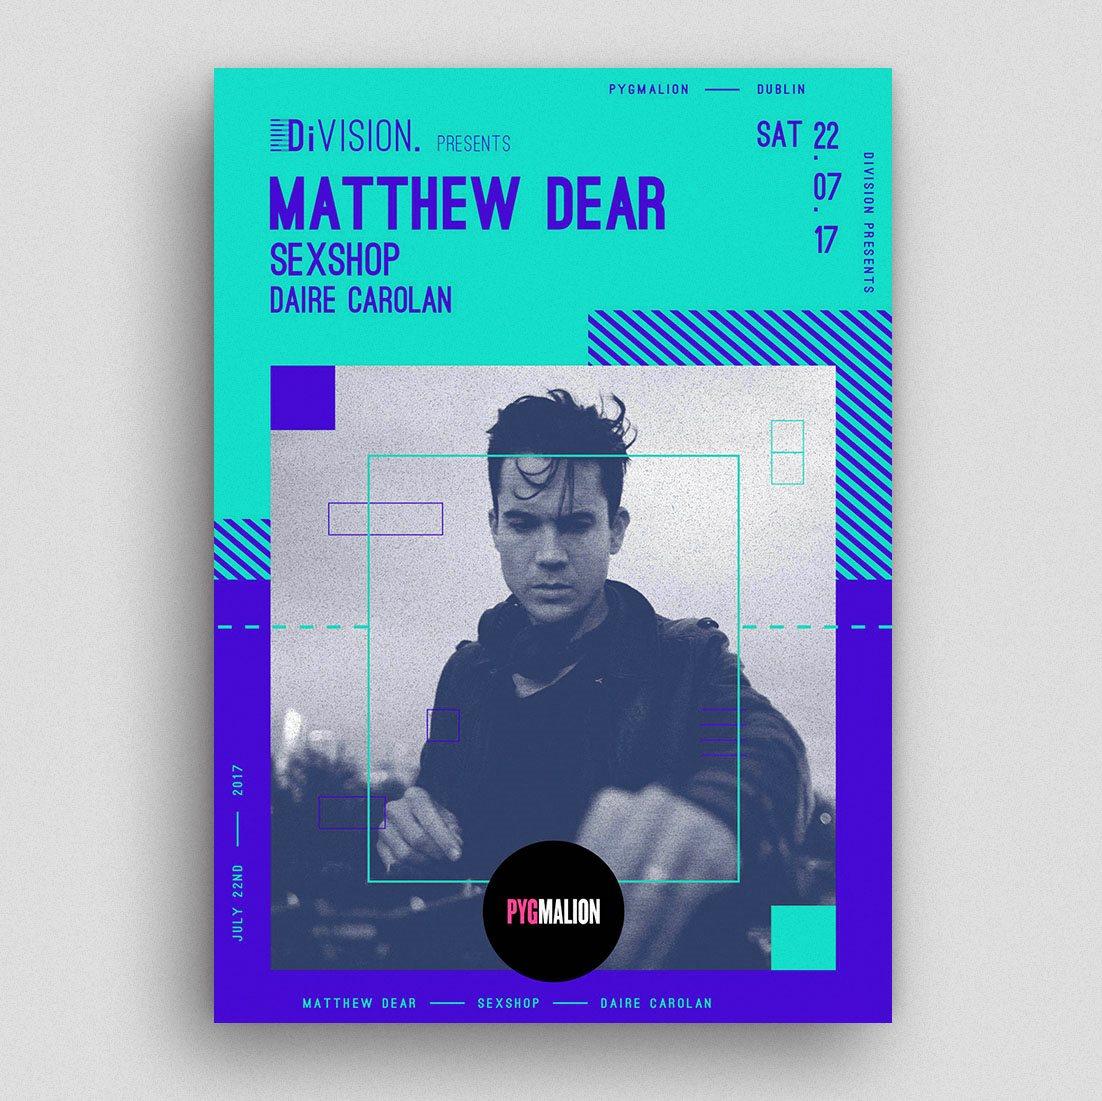 Division presents Matthew Dear - Flyer front